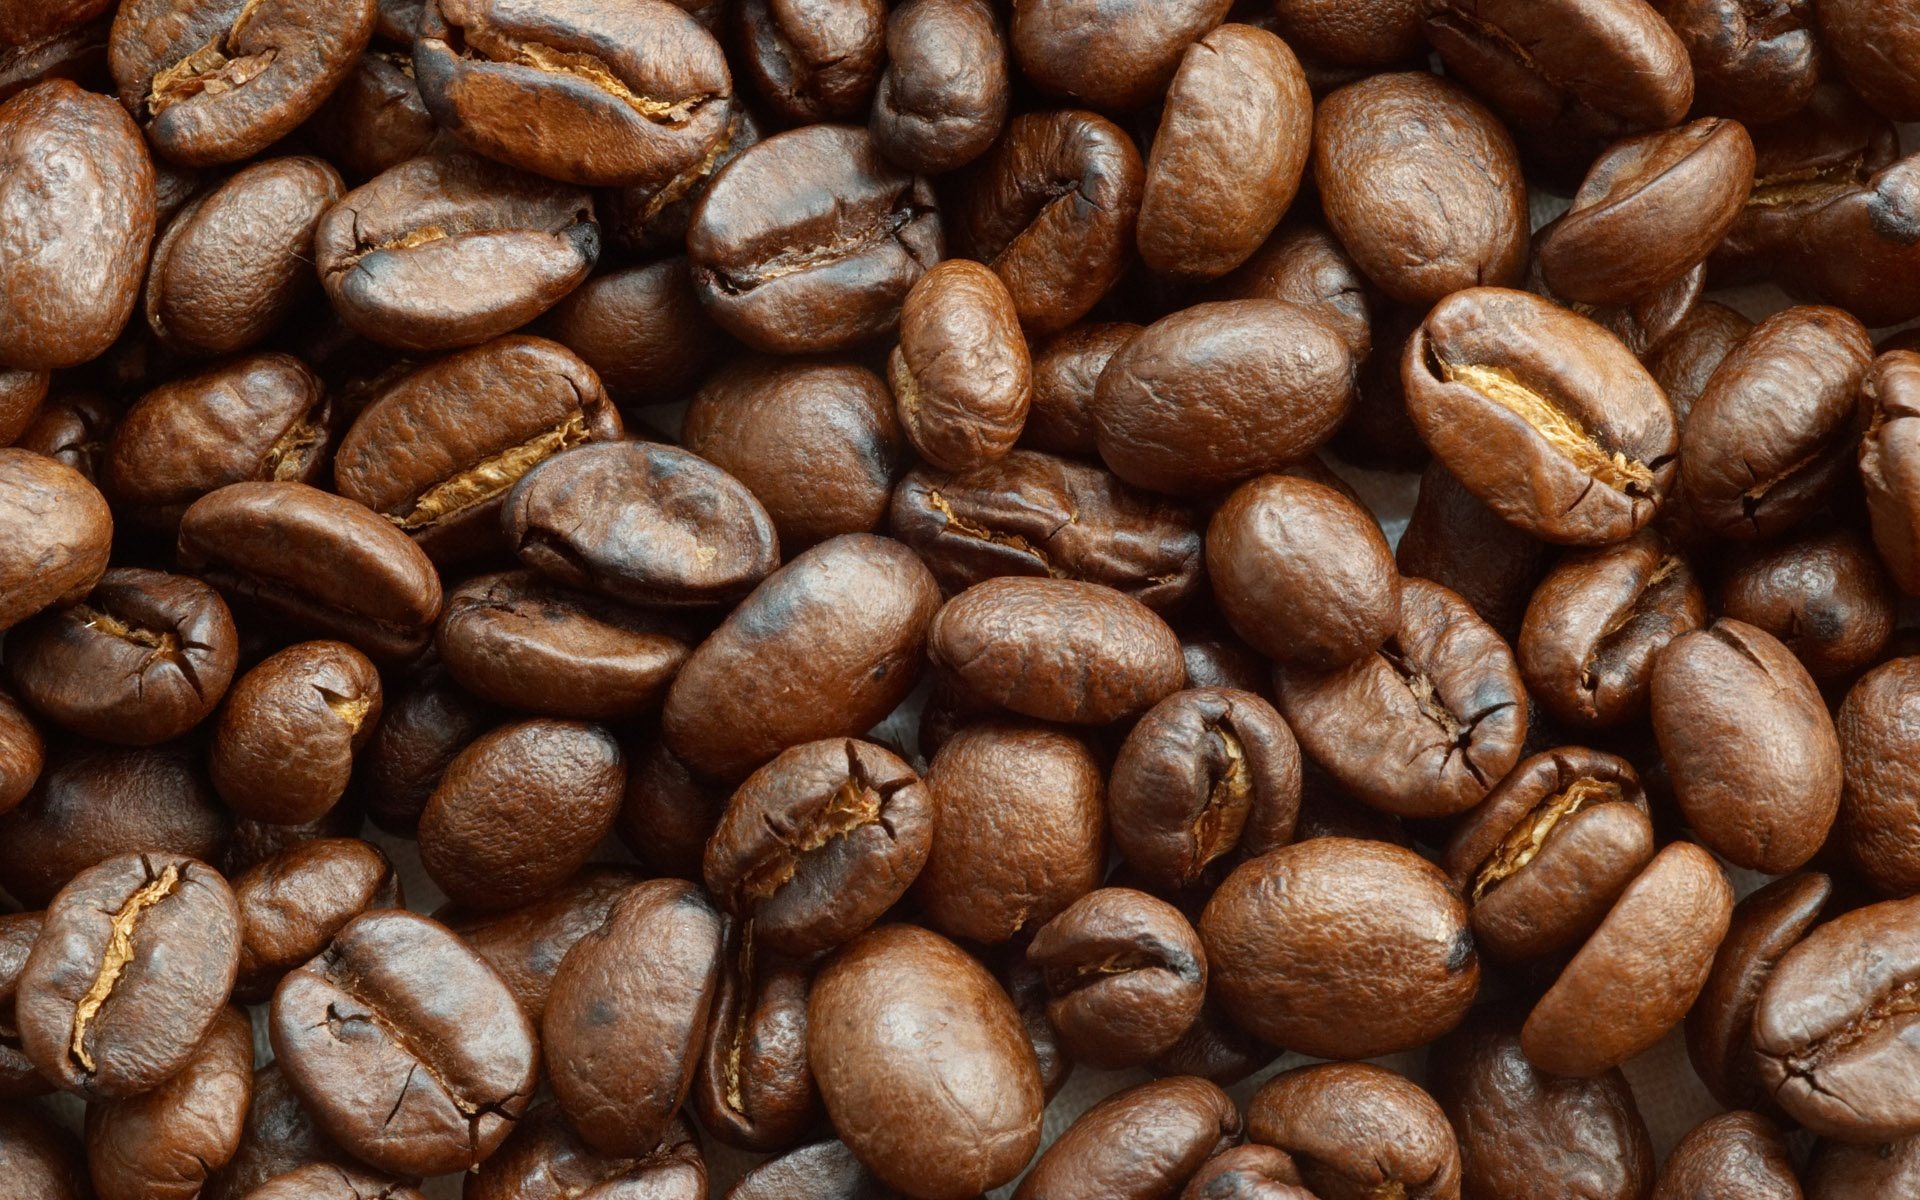 Brown Coffee Beans Wallpaper